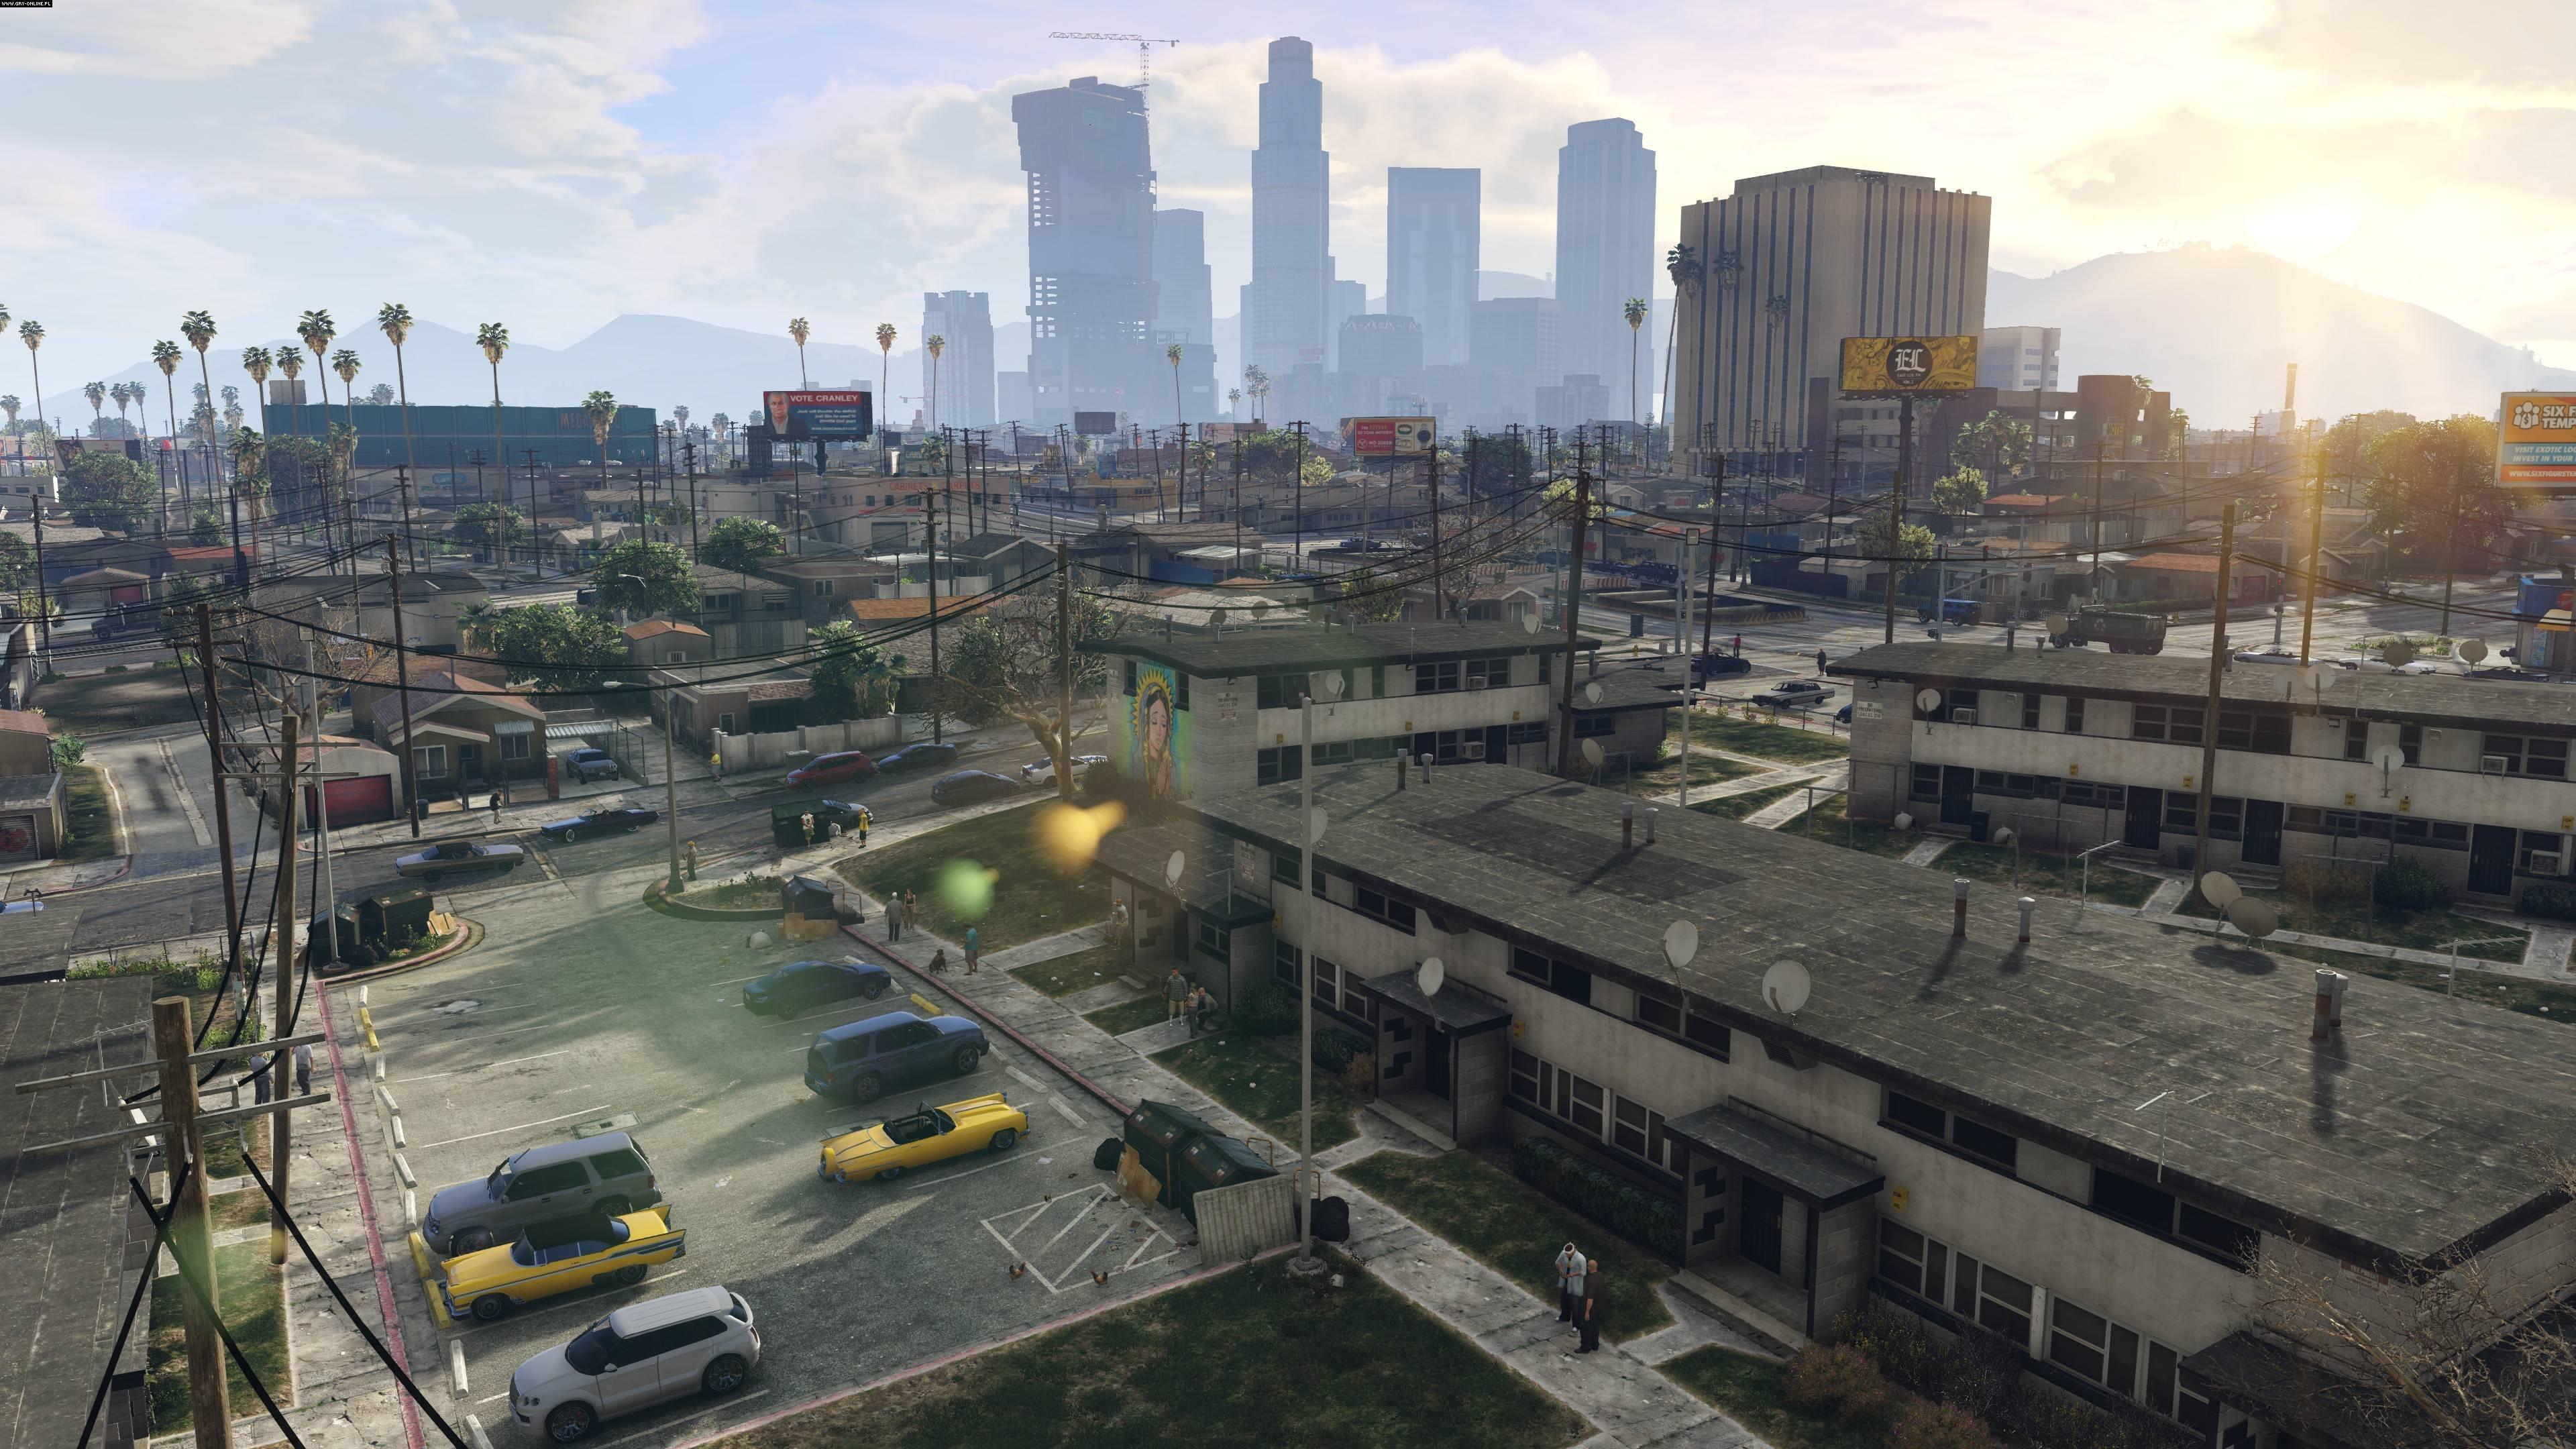 Grand Theft Auto V PC Games Image 4/396, Rockstar Games